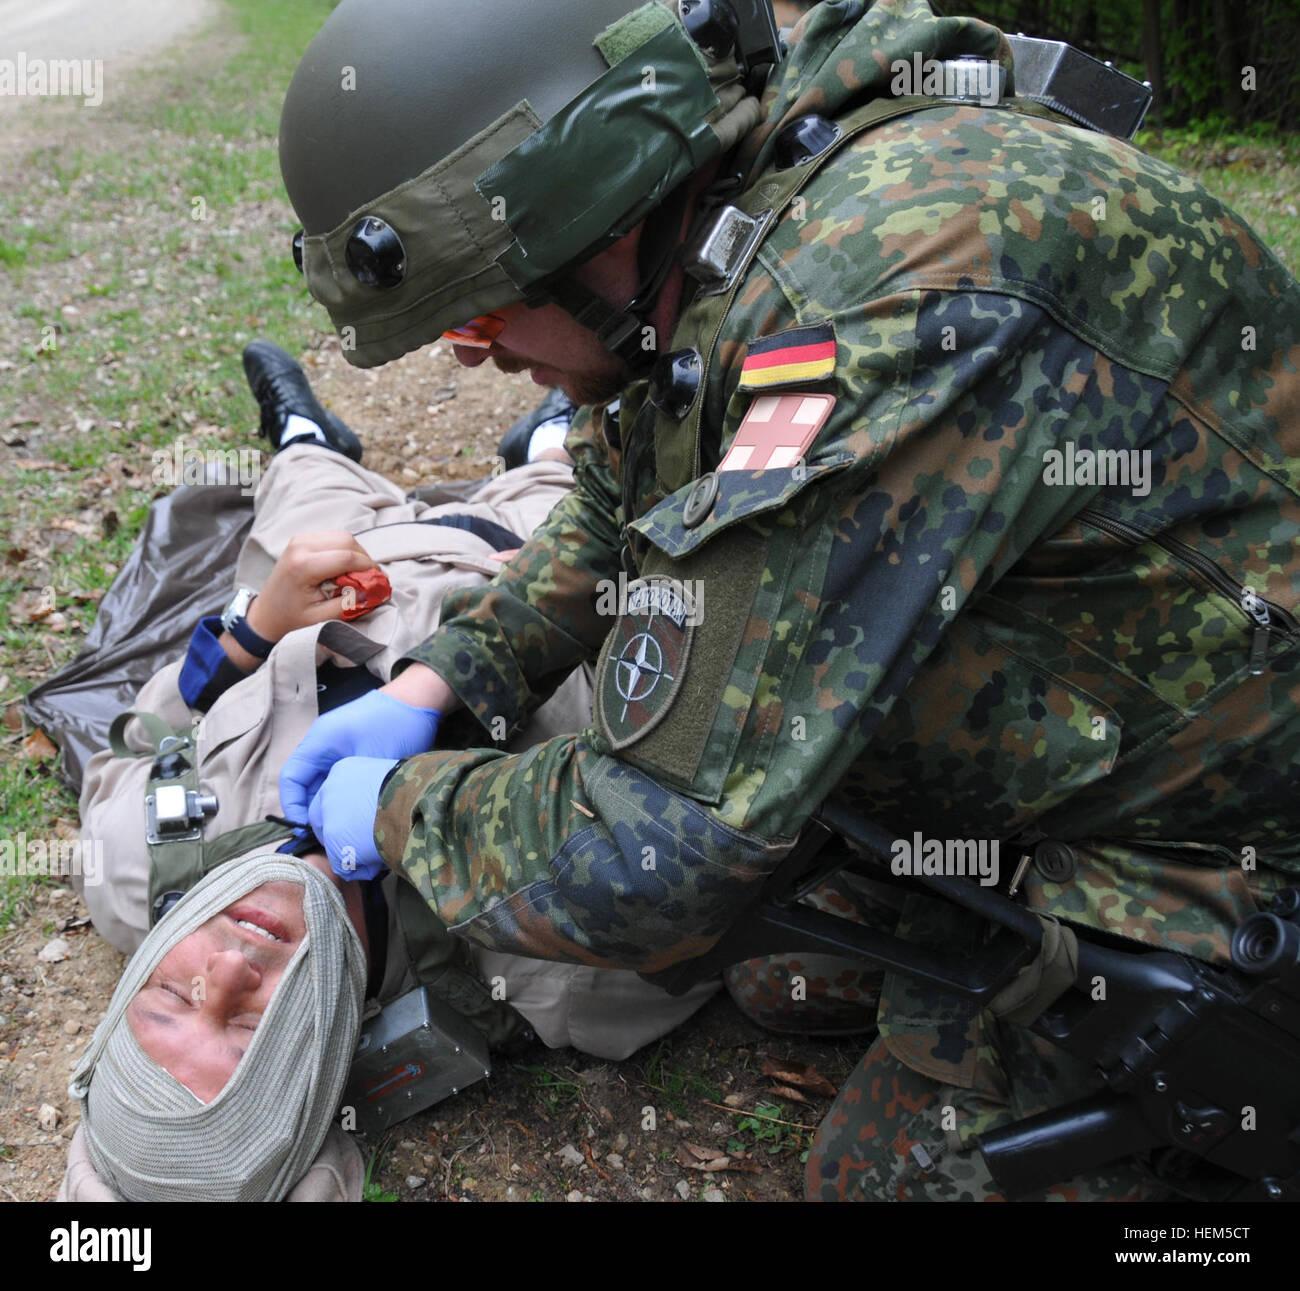 Großartig Uns Armee Veteran Lebenslauf Ideen - Entry Level Resume ...